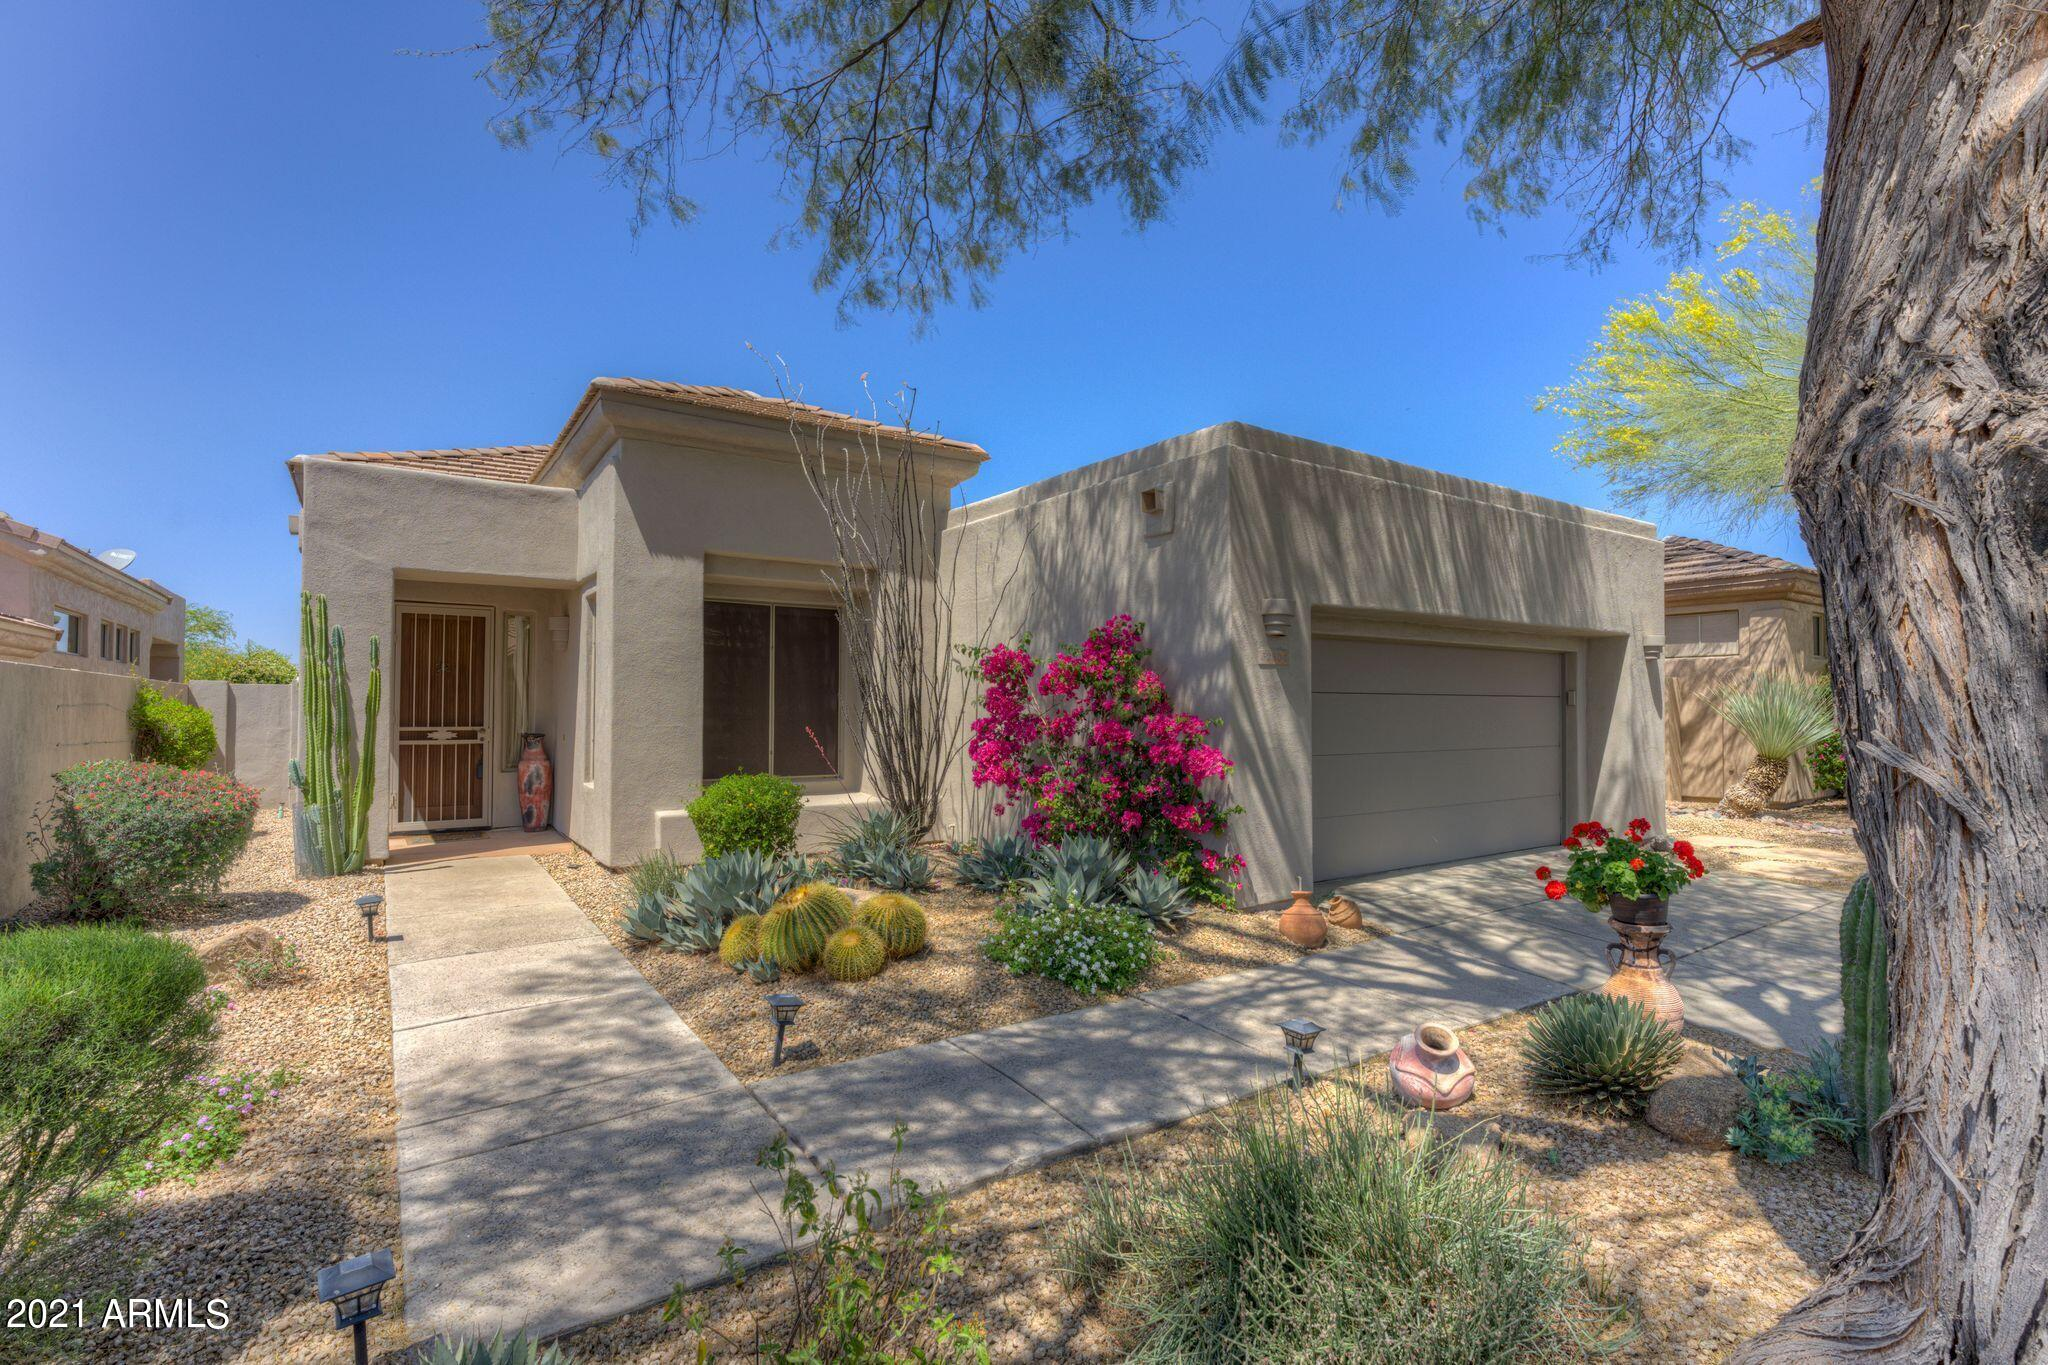 32804 N 69th Street, Scottsdale, AZ 85266, 3 Bedrooms Bedrooms, ,Residential Lease,For Rent,32804 N 69th Street,6246523